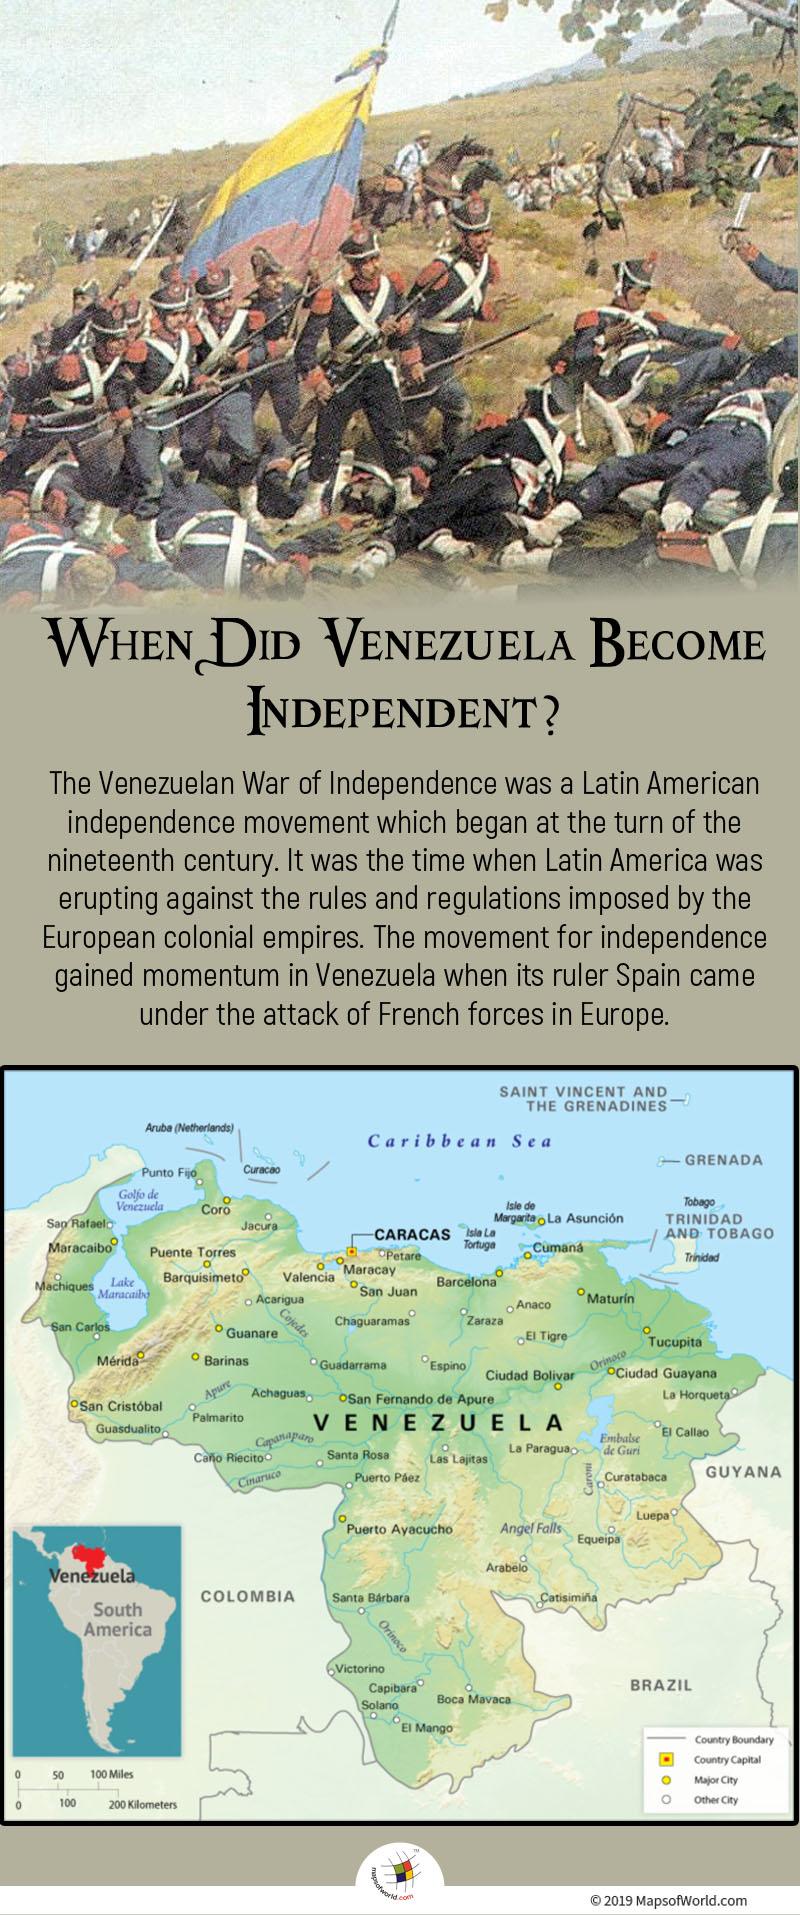 The Venezuelan War of Independence